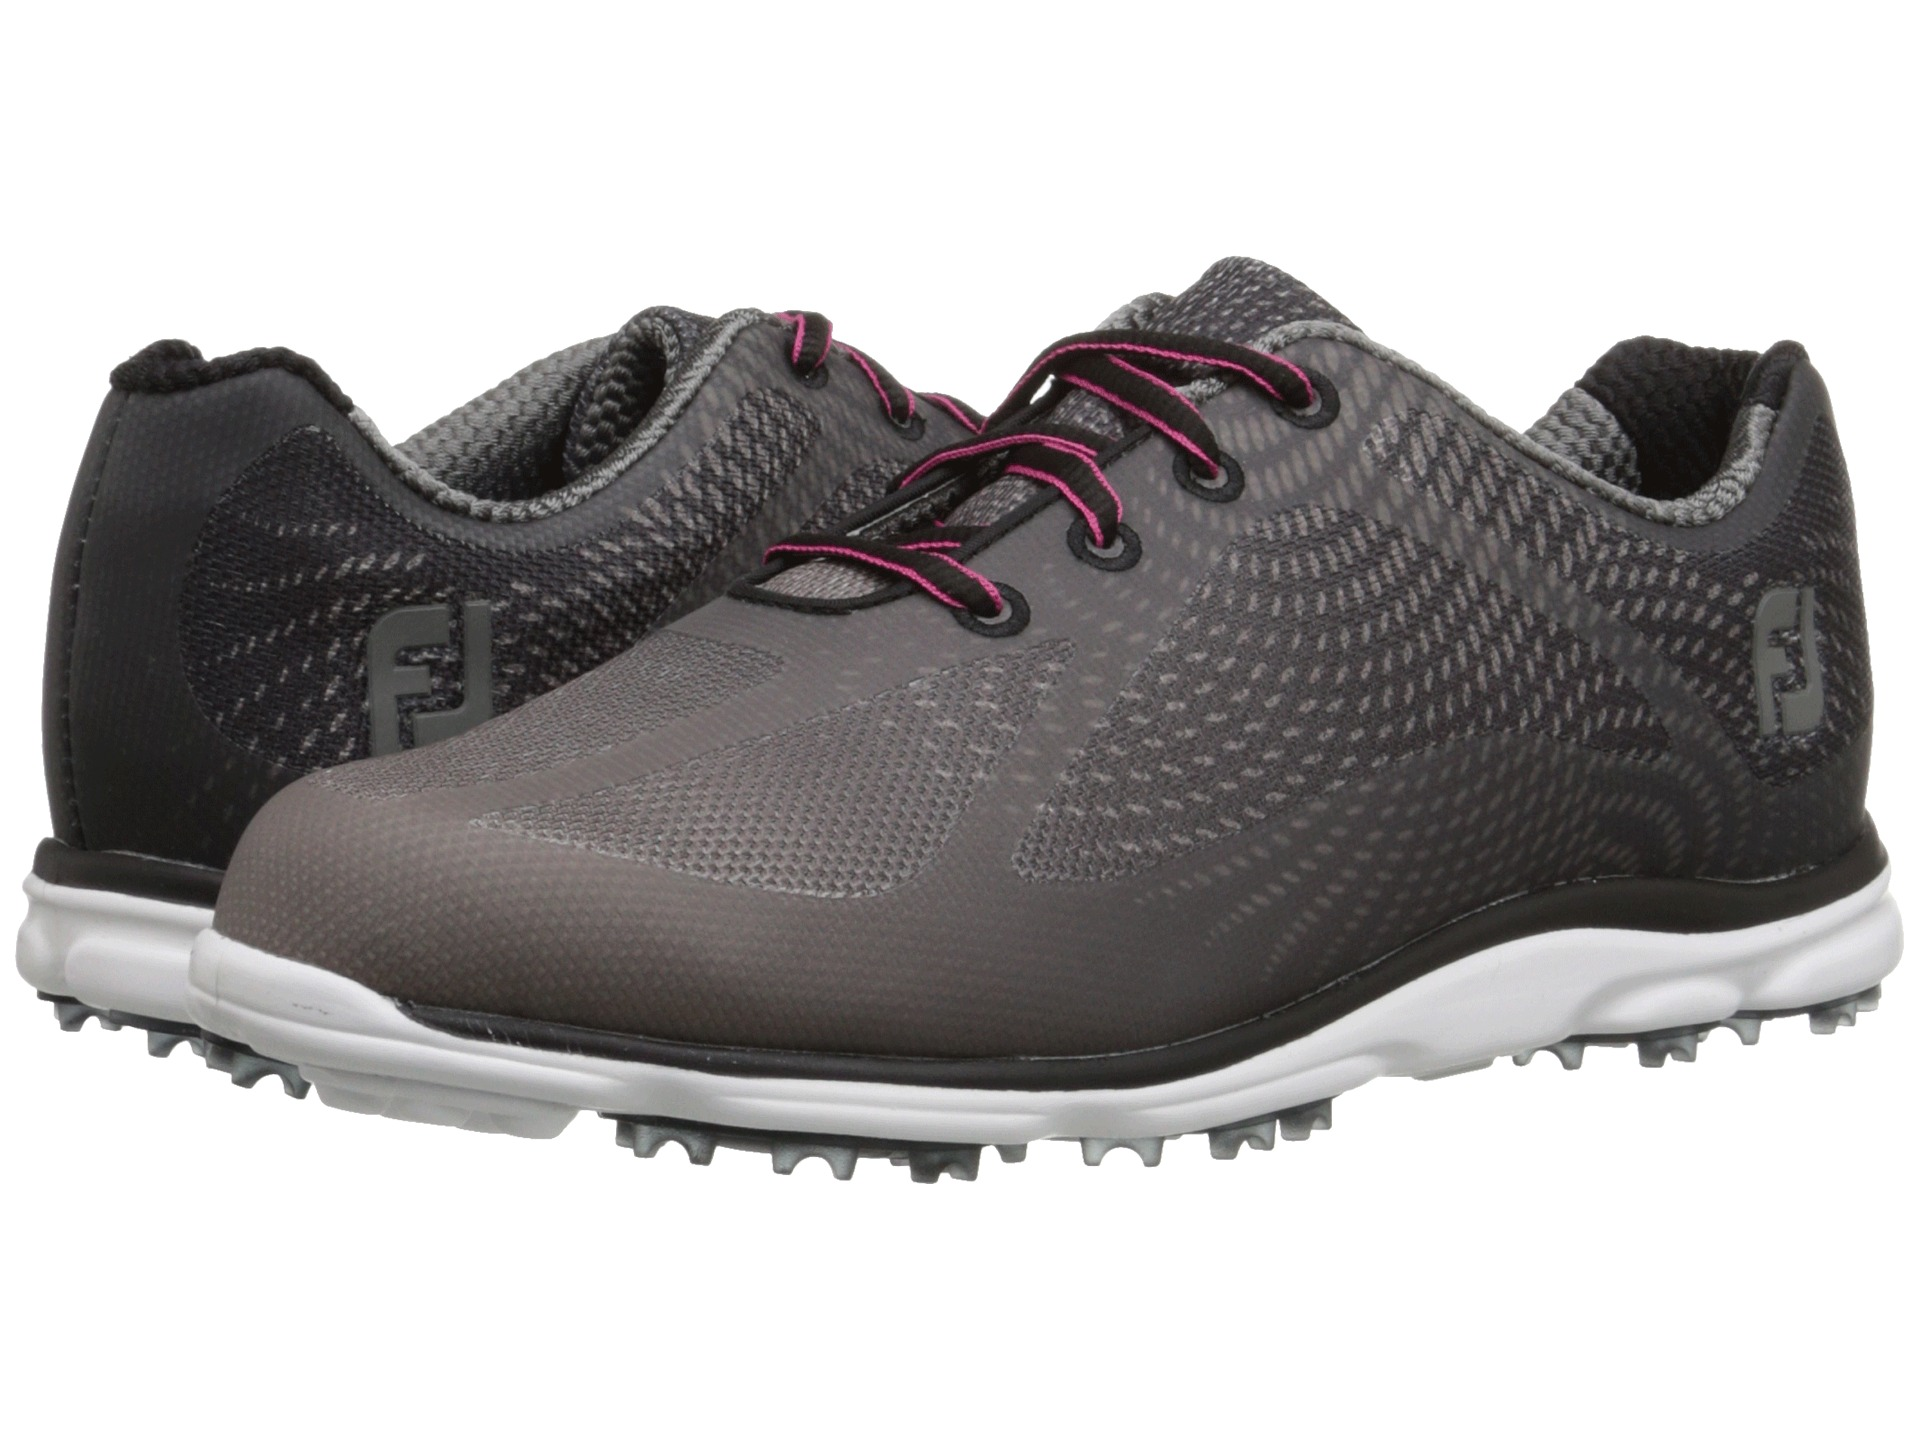 Zappos Footjoy Golf Shoes